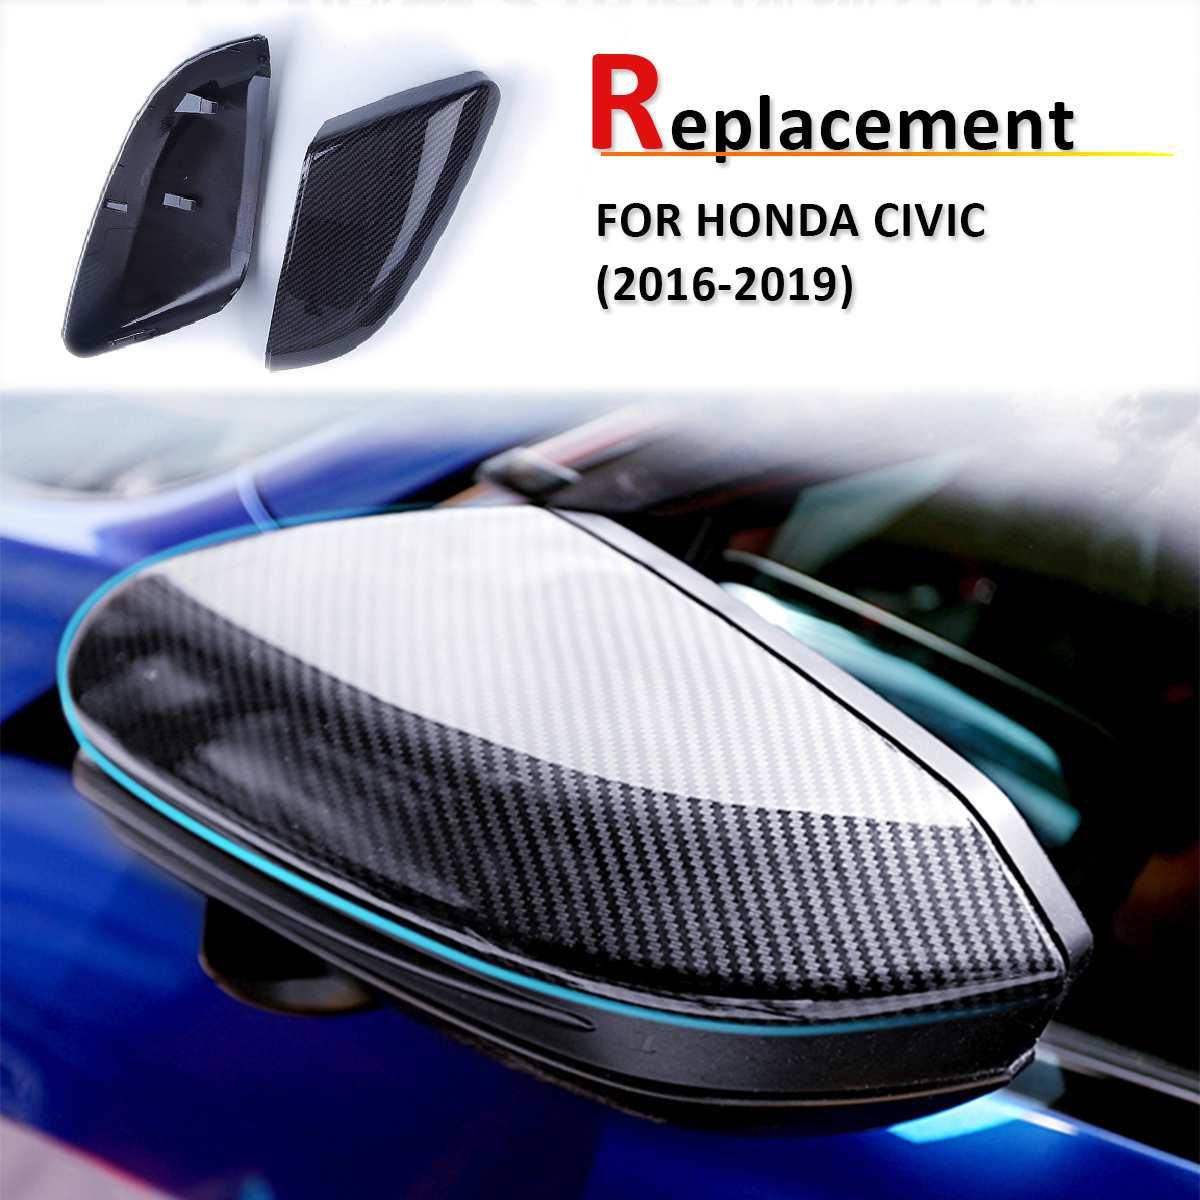 Para Honda para Civic 2016 2017 2018 reemplazo estilo de fibra de carbono ABS vista trasera puerta lateral espejo cubierta de ala tapas de retrovisor